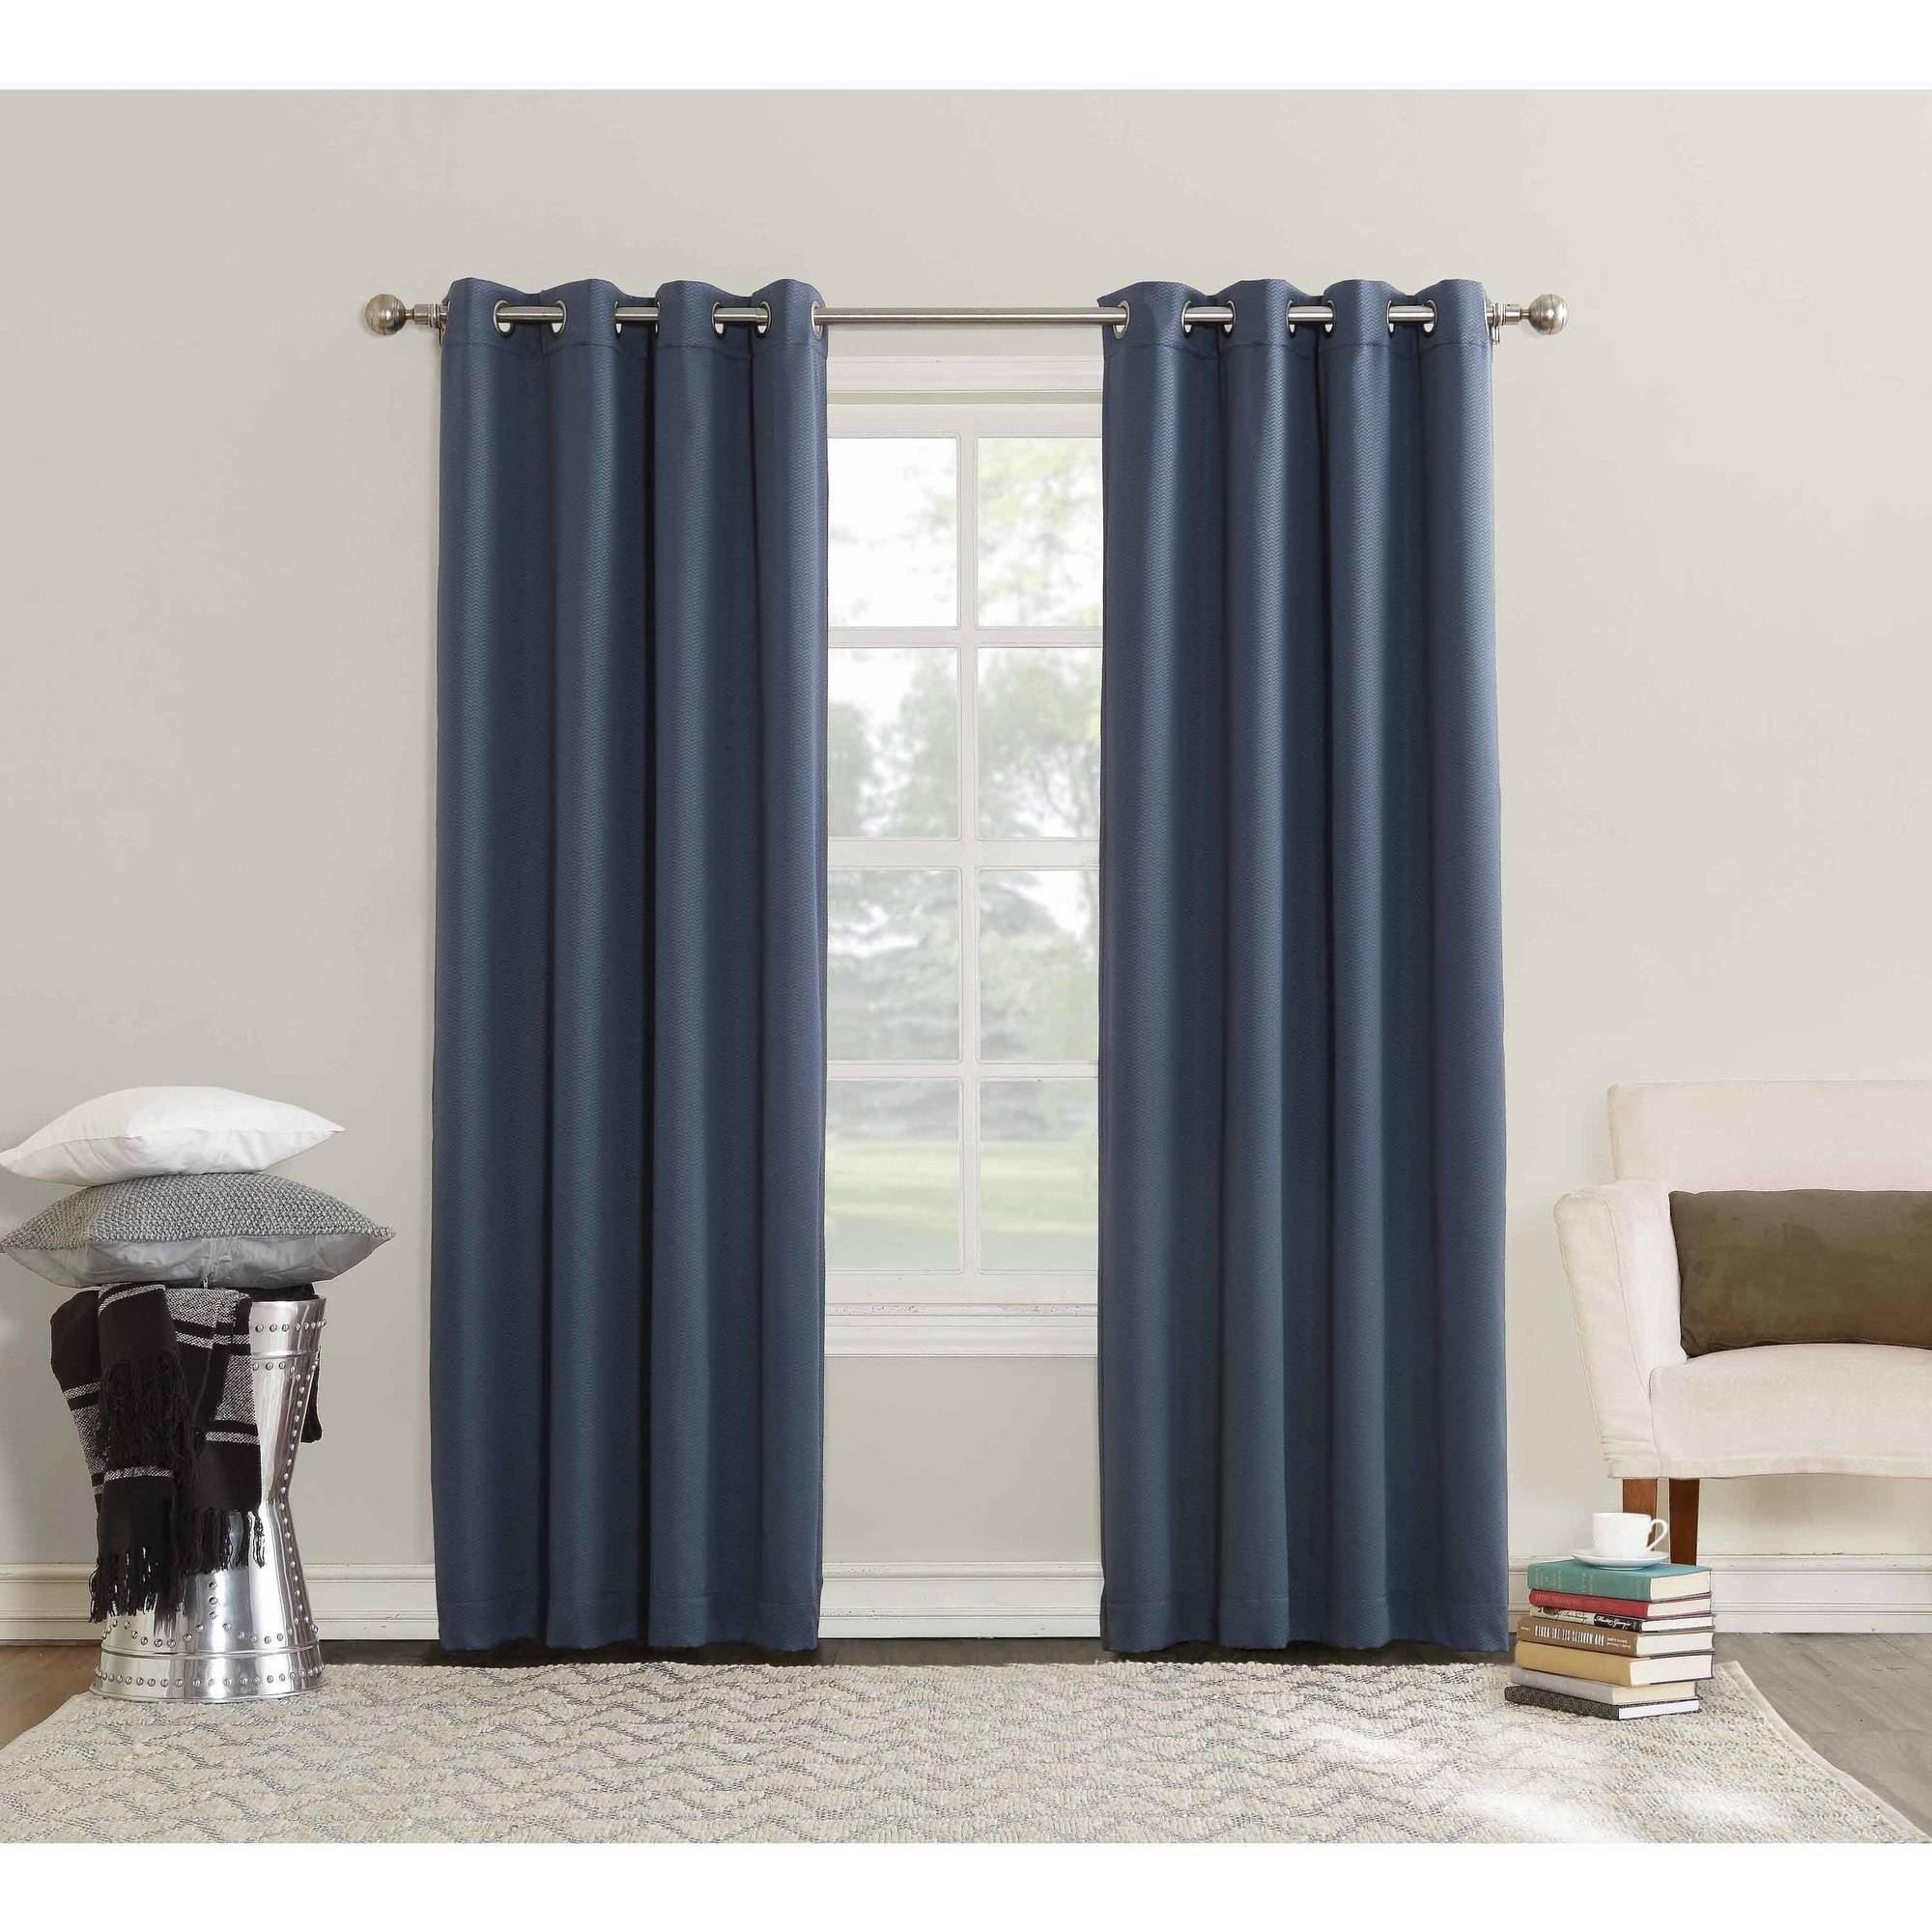 Sun Zero Ella Room Darkening Triple Lined Grommet Curtain Panel by S. Lichtenberg & Co.